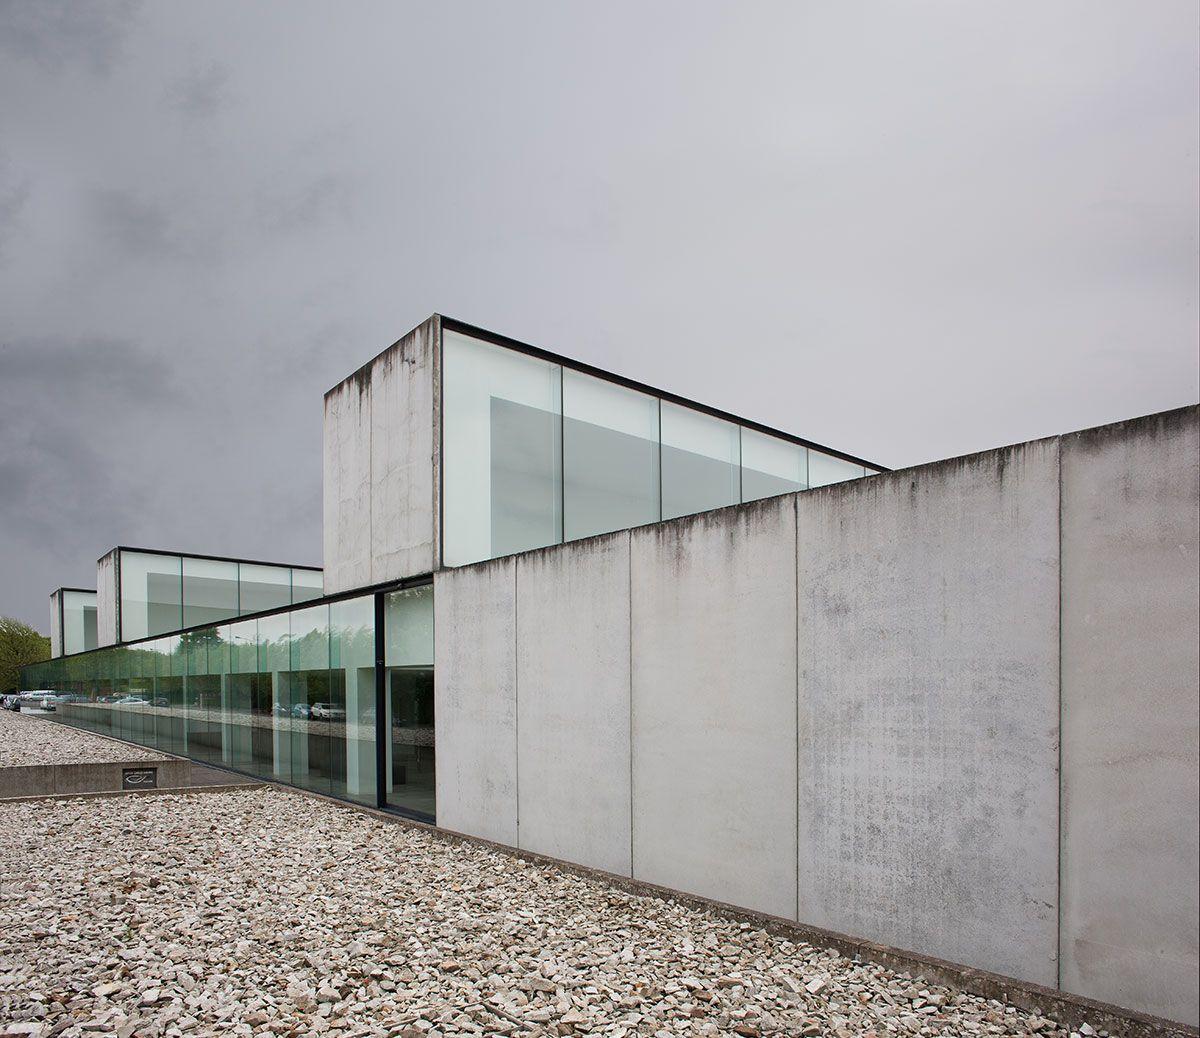 Office building at Waregem | Facade architecture, Architecture ...